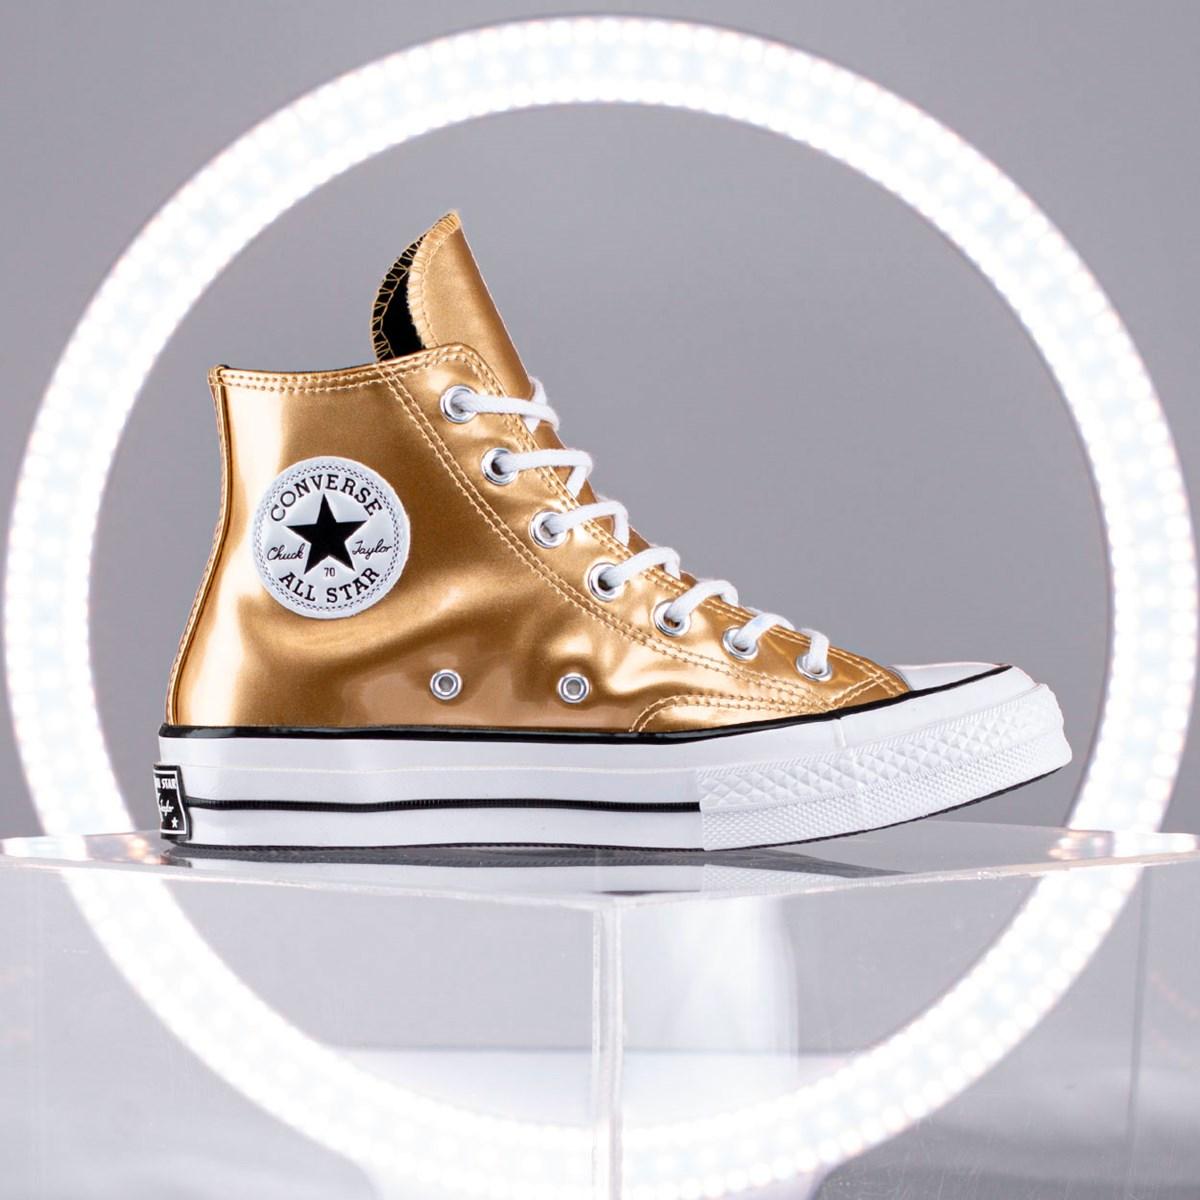 Tênis Converse Chuck 70 Industrial Glam Hi Gold Black 568797C Gold Black